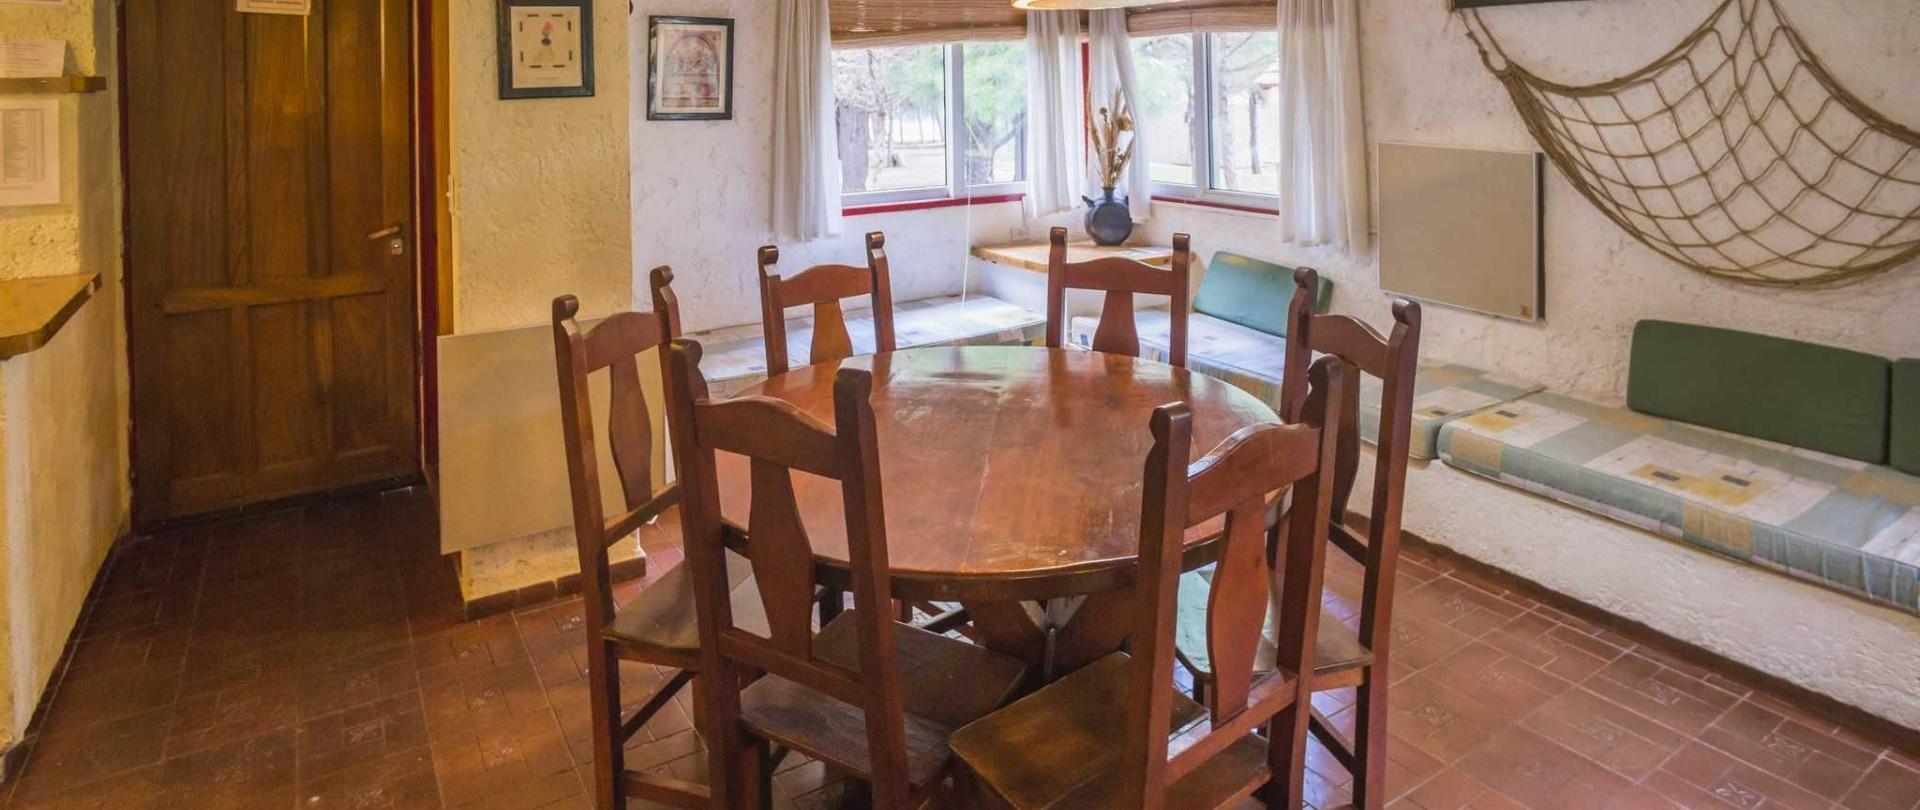 Sitting room of a cabin at Cabañas Del Pastizal, Uspallata, Mendoza Province, Argentina-2